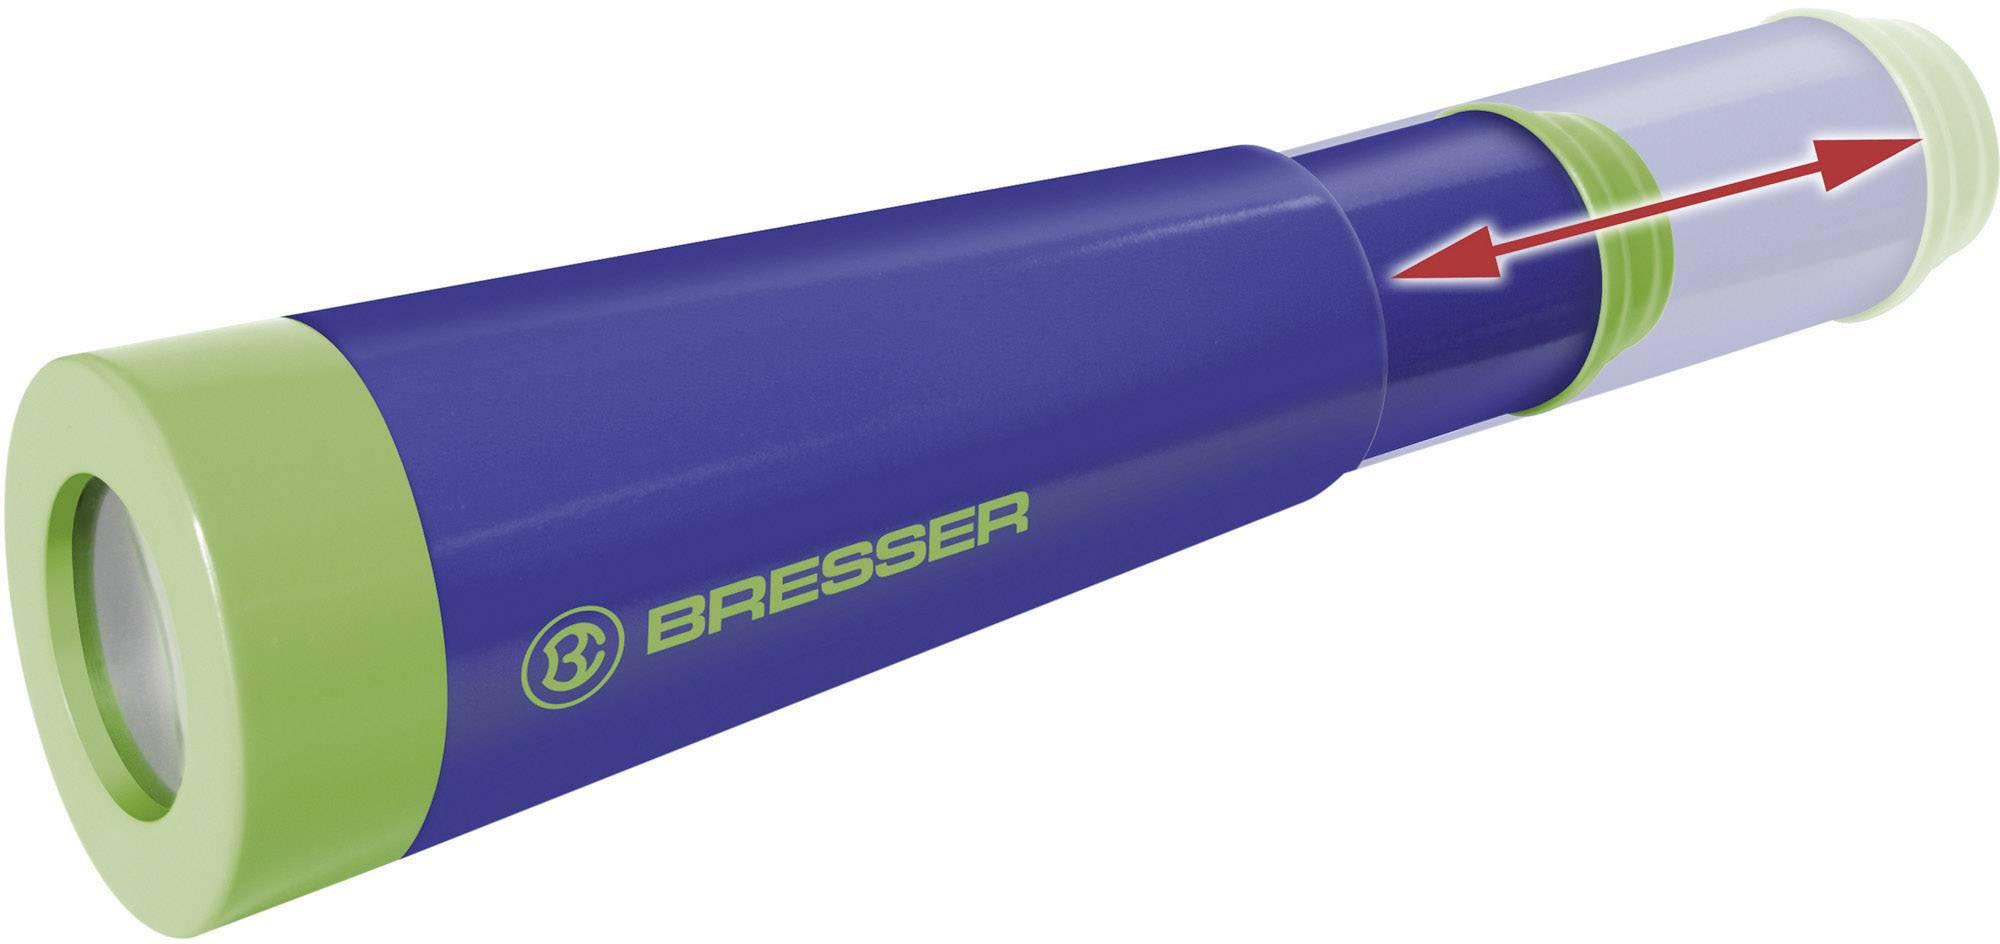 Detský ďalekohľad Bresser Optik Junior, 32 mm, modrozelená